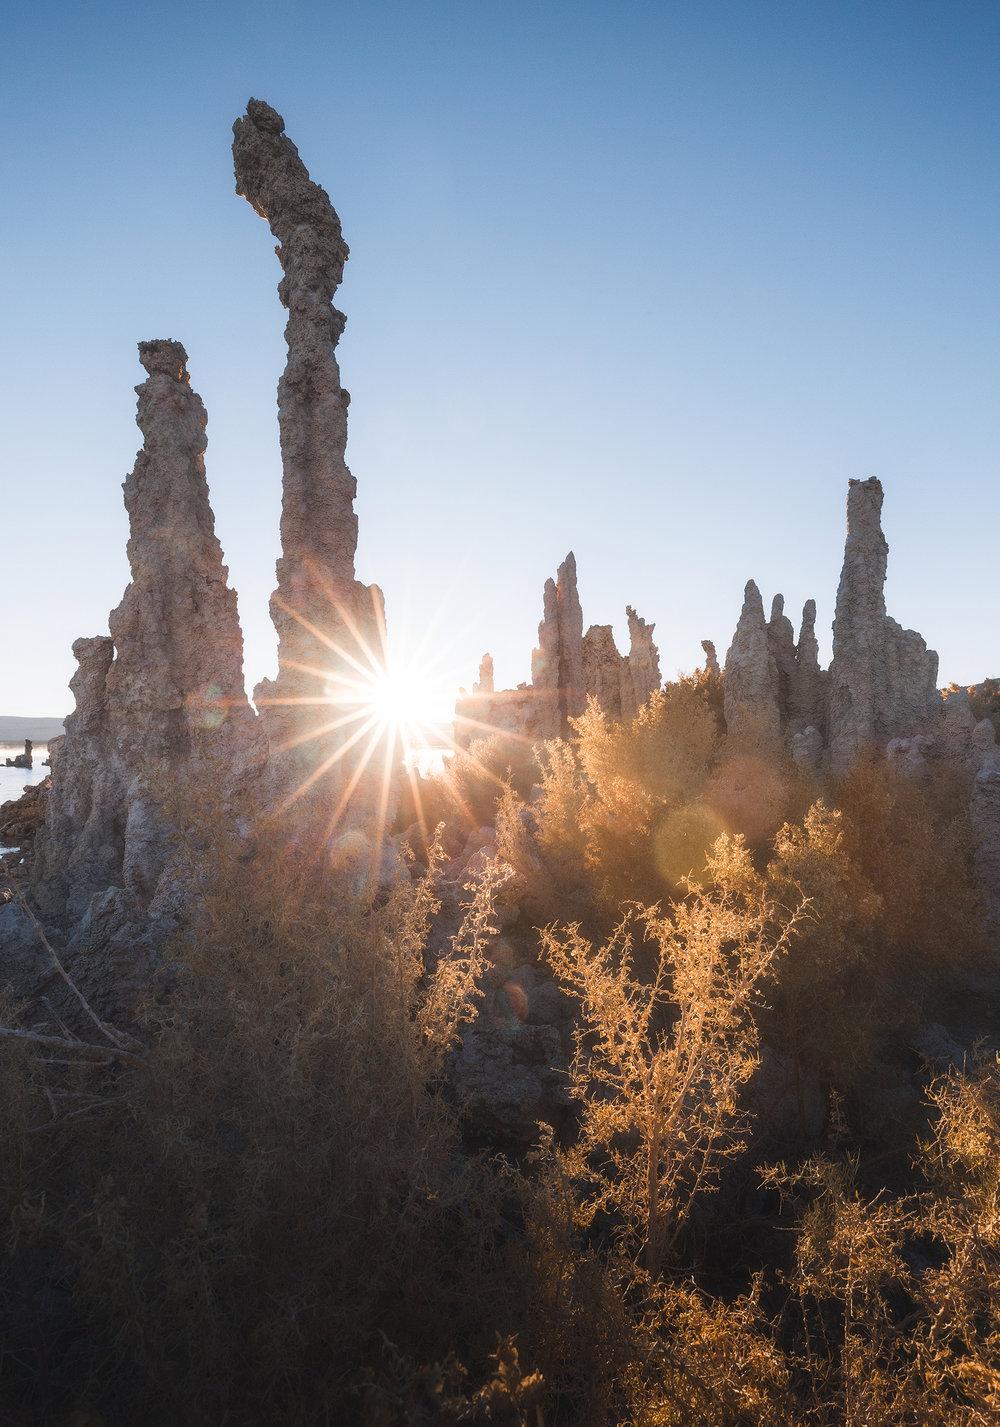 The tufa formations at sunrise